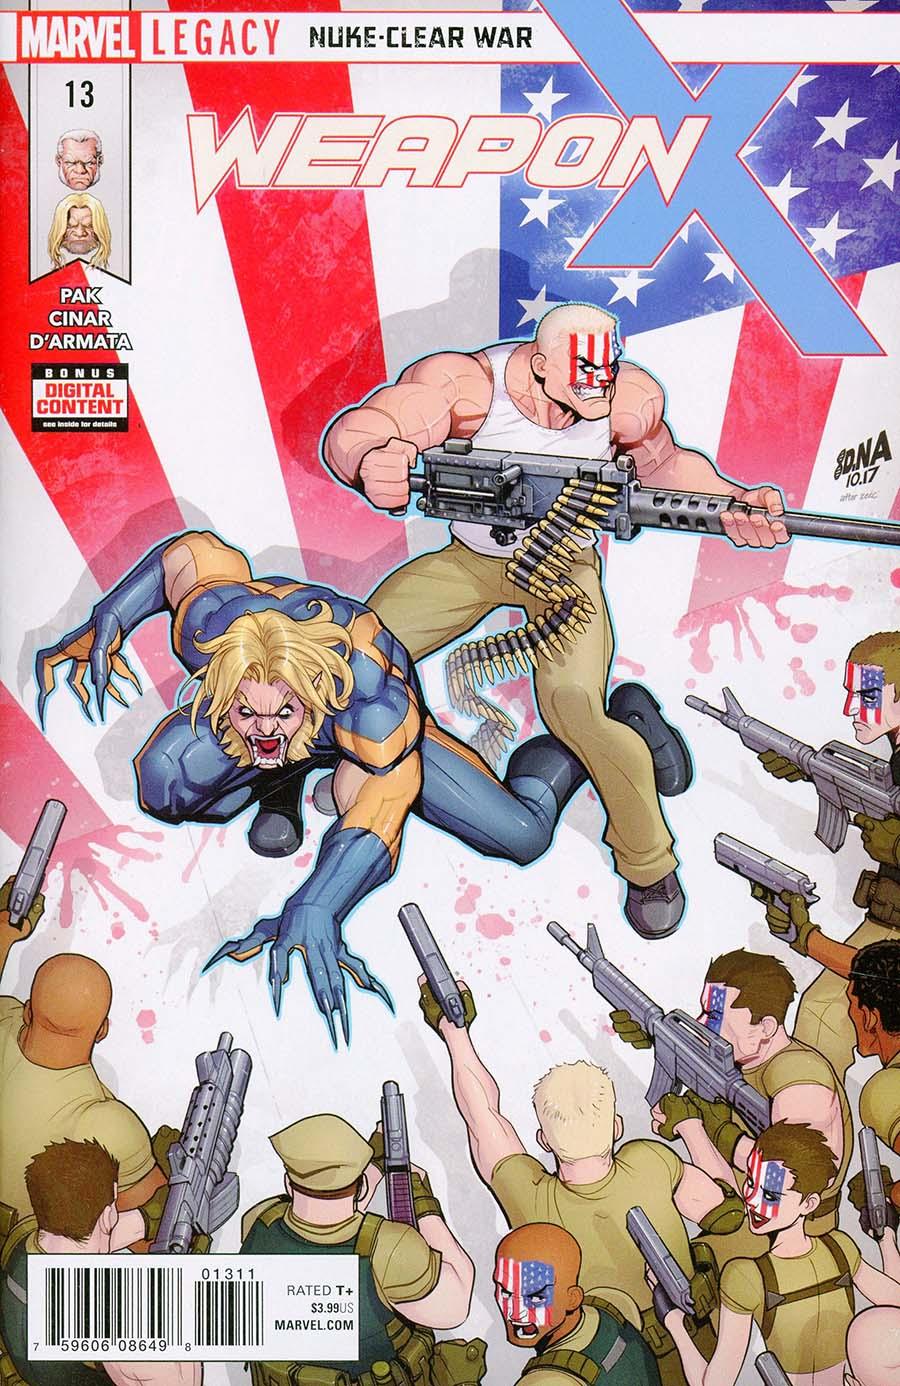 Nuke-Clear War Part Two